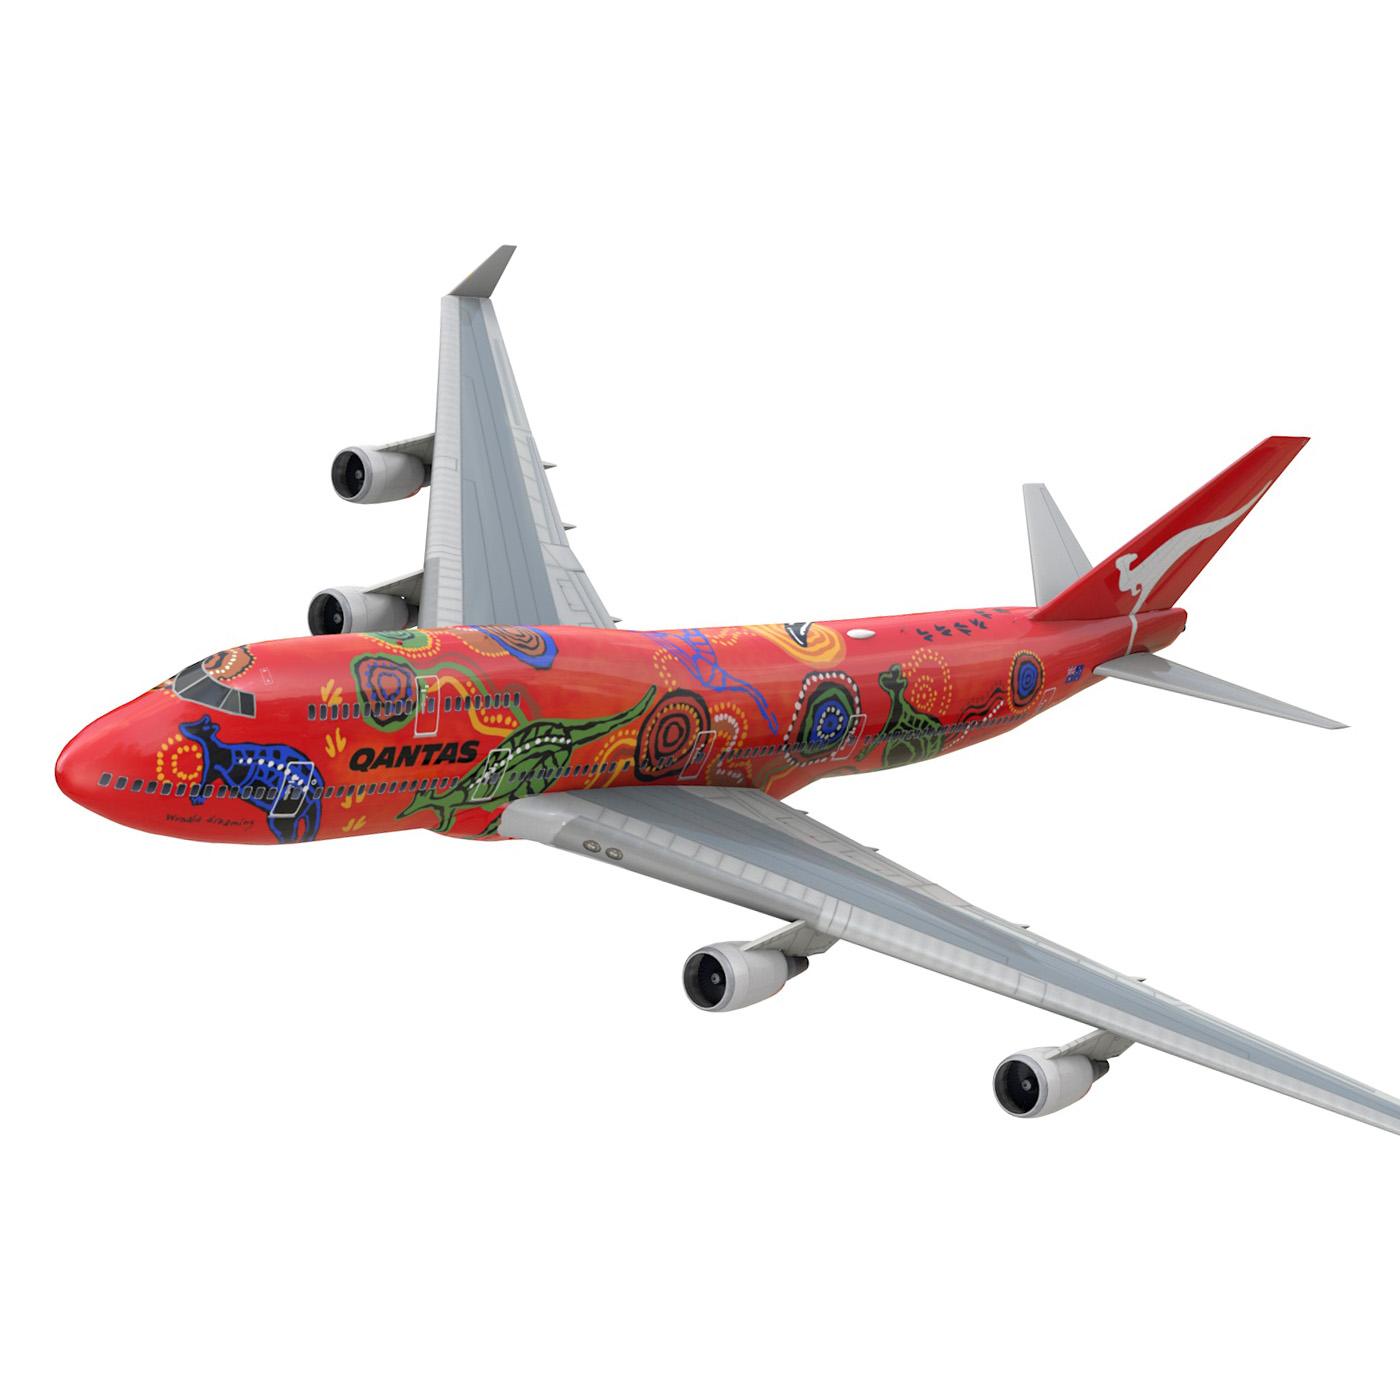 boeing 747 qantas wunala dreaming 3d model 3ds fbx c4d lwo obj 281782